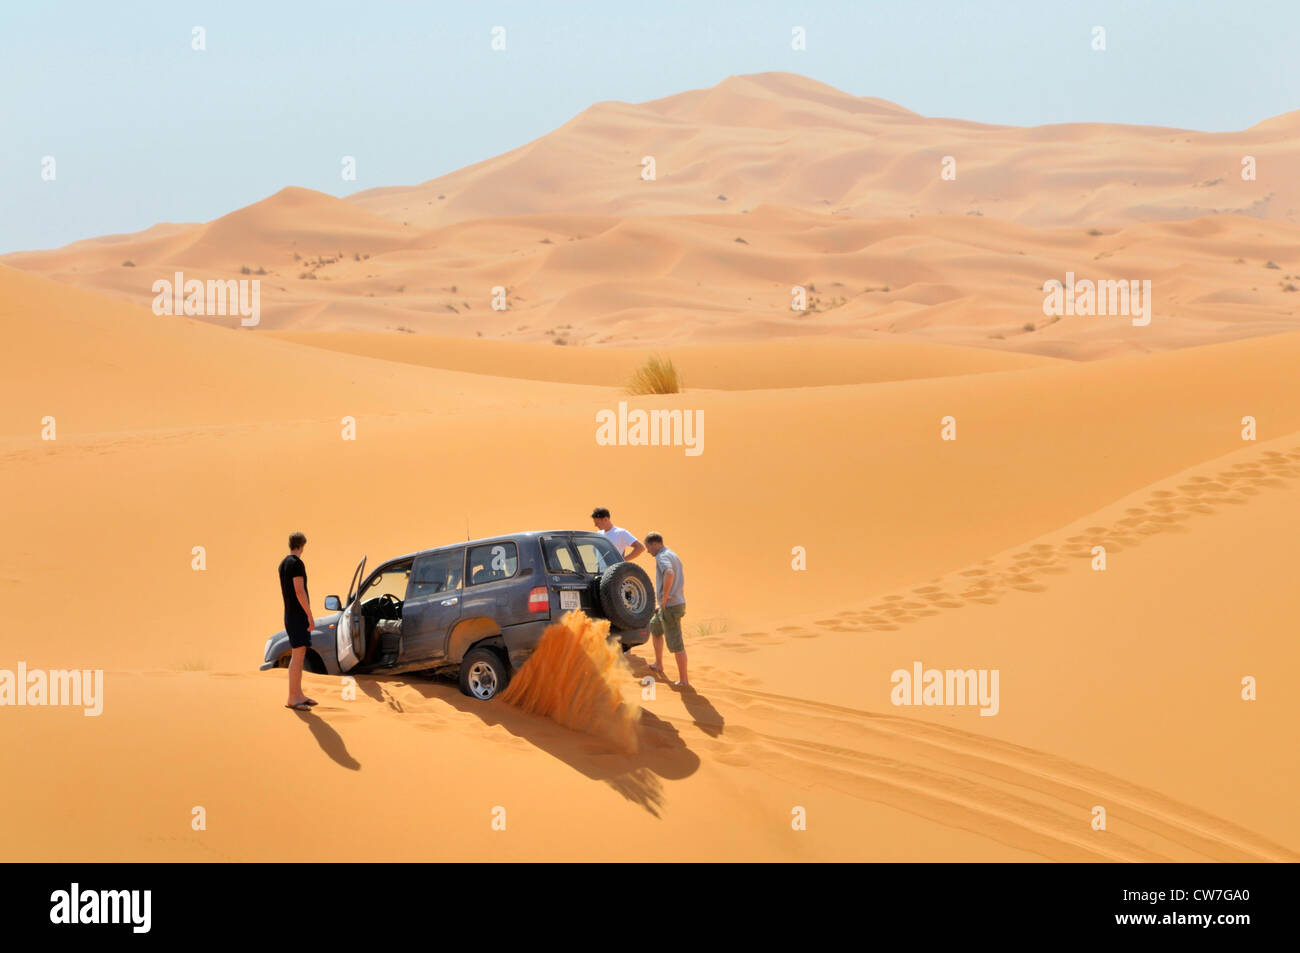 off-road vehicle stuck in sand, Morocco, Erg Chebbi - Stock Image